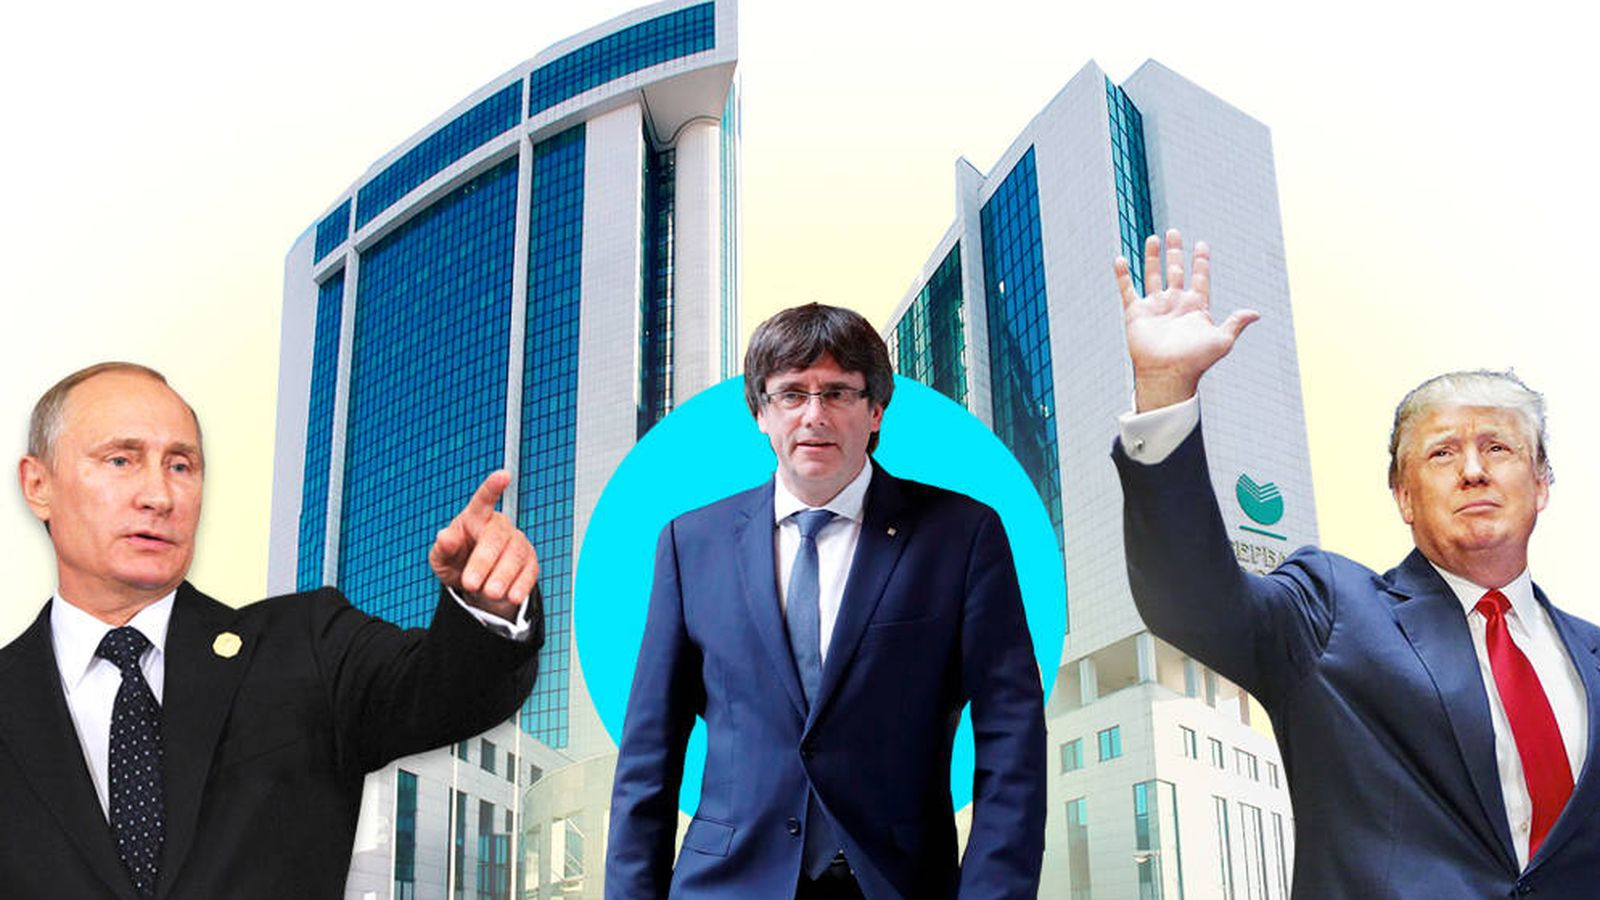 Foto: Vladimir Putin, Carles Puigdemont y Donald Trump. (EC)